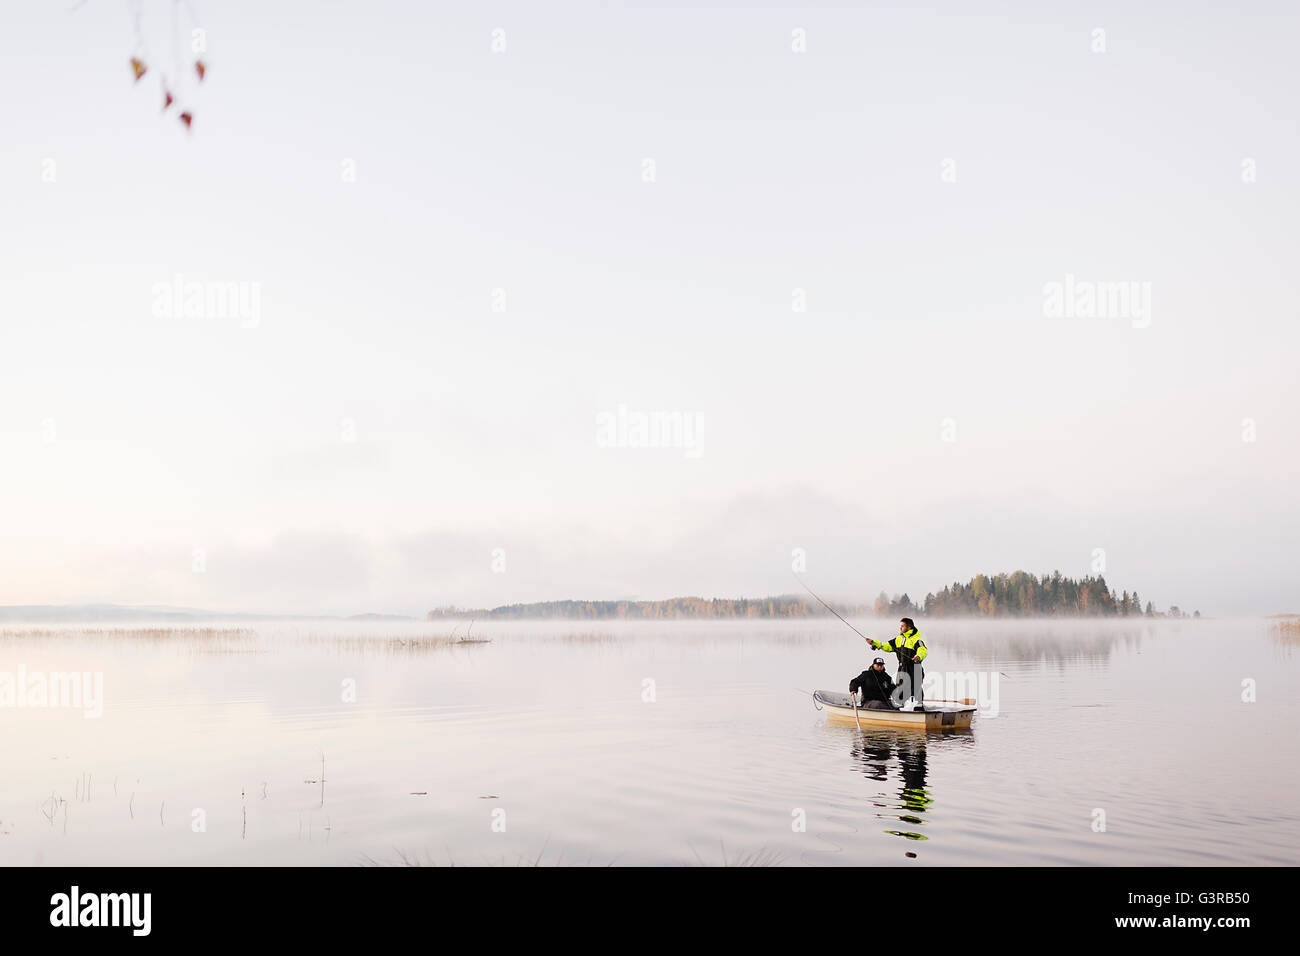 Sweden, Vastmanland, Bergslagen, Torrvarpen, Young men fishing in lake at sunset - Stock Image